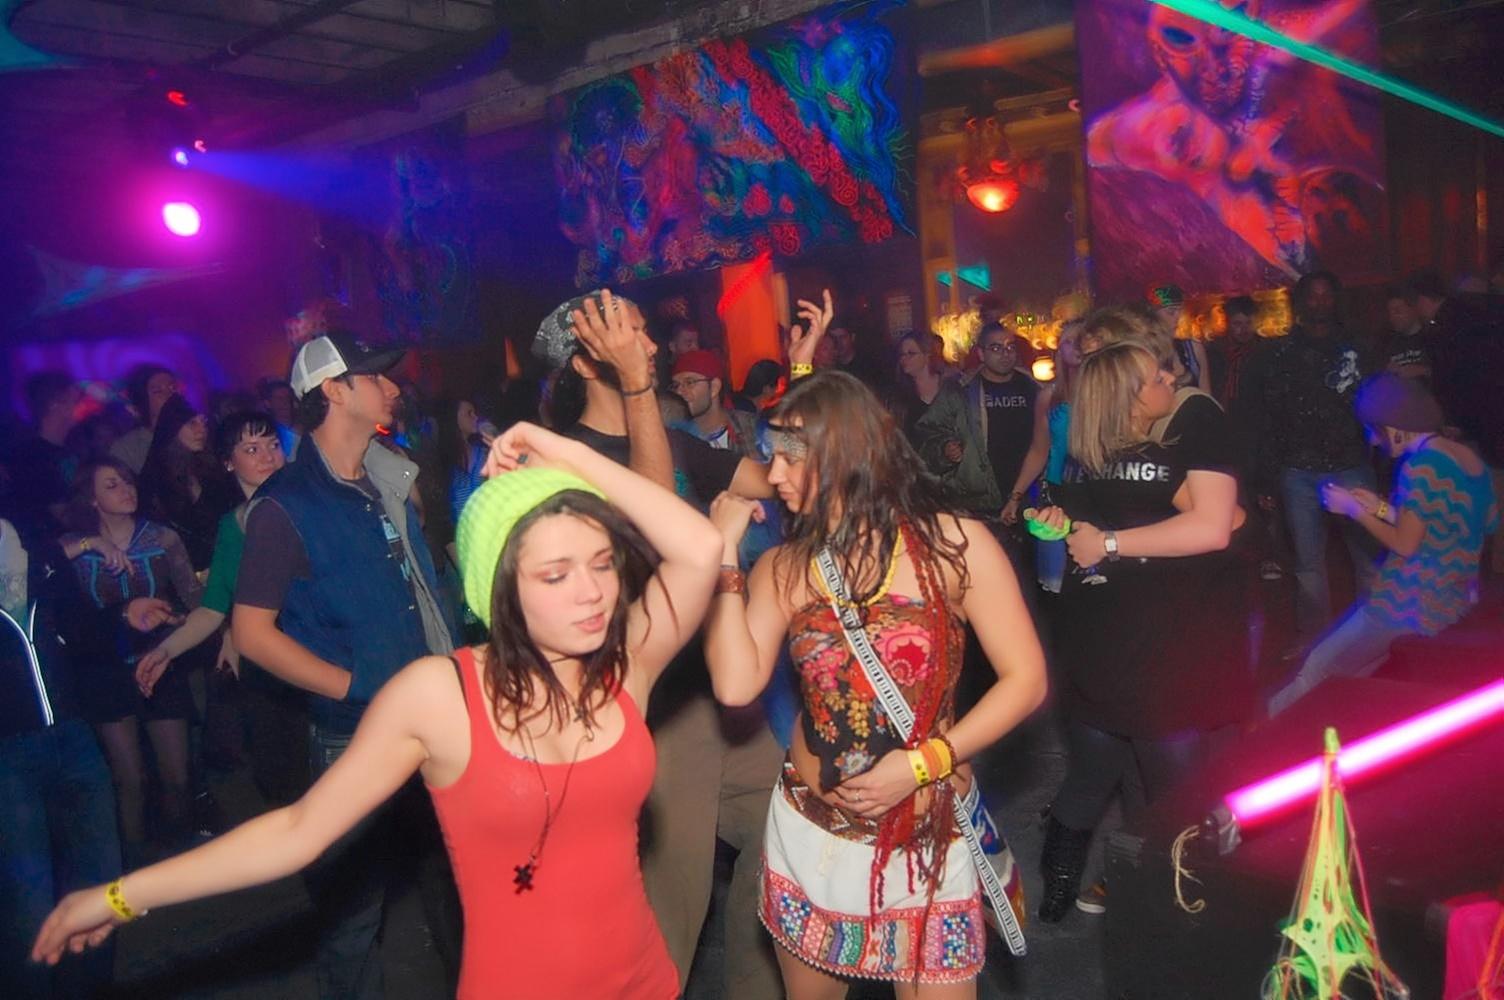 Scene from techno rave